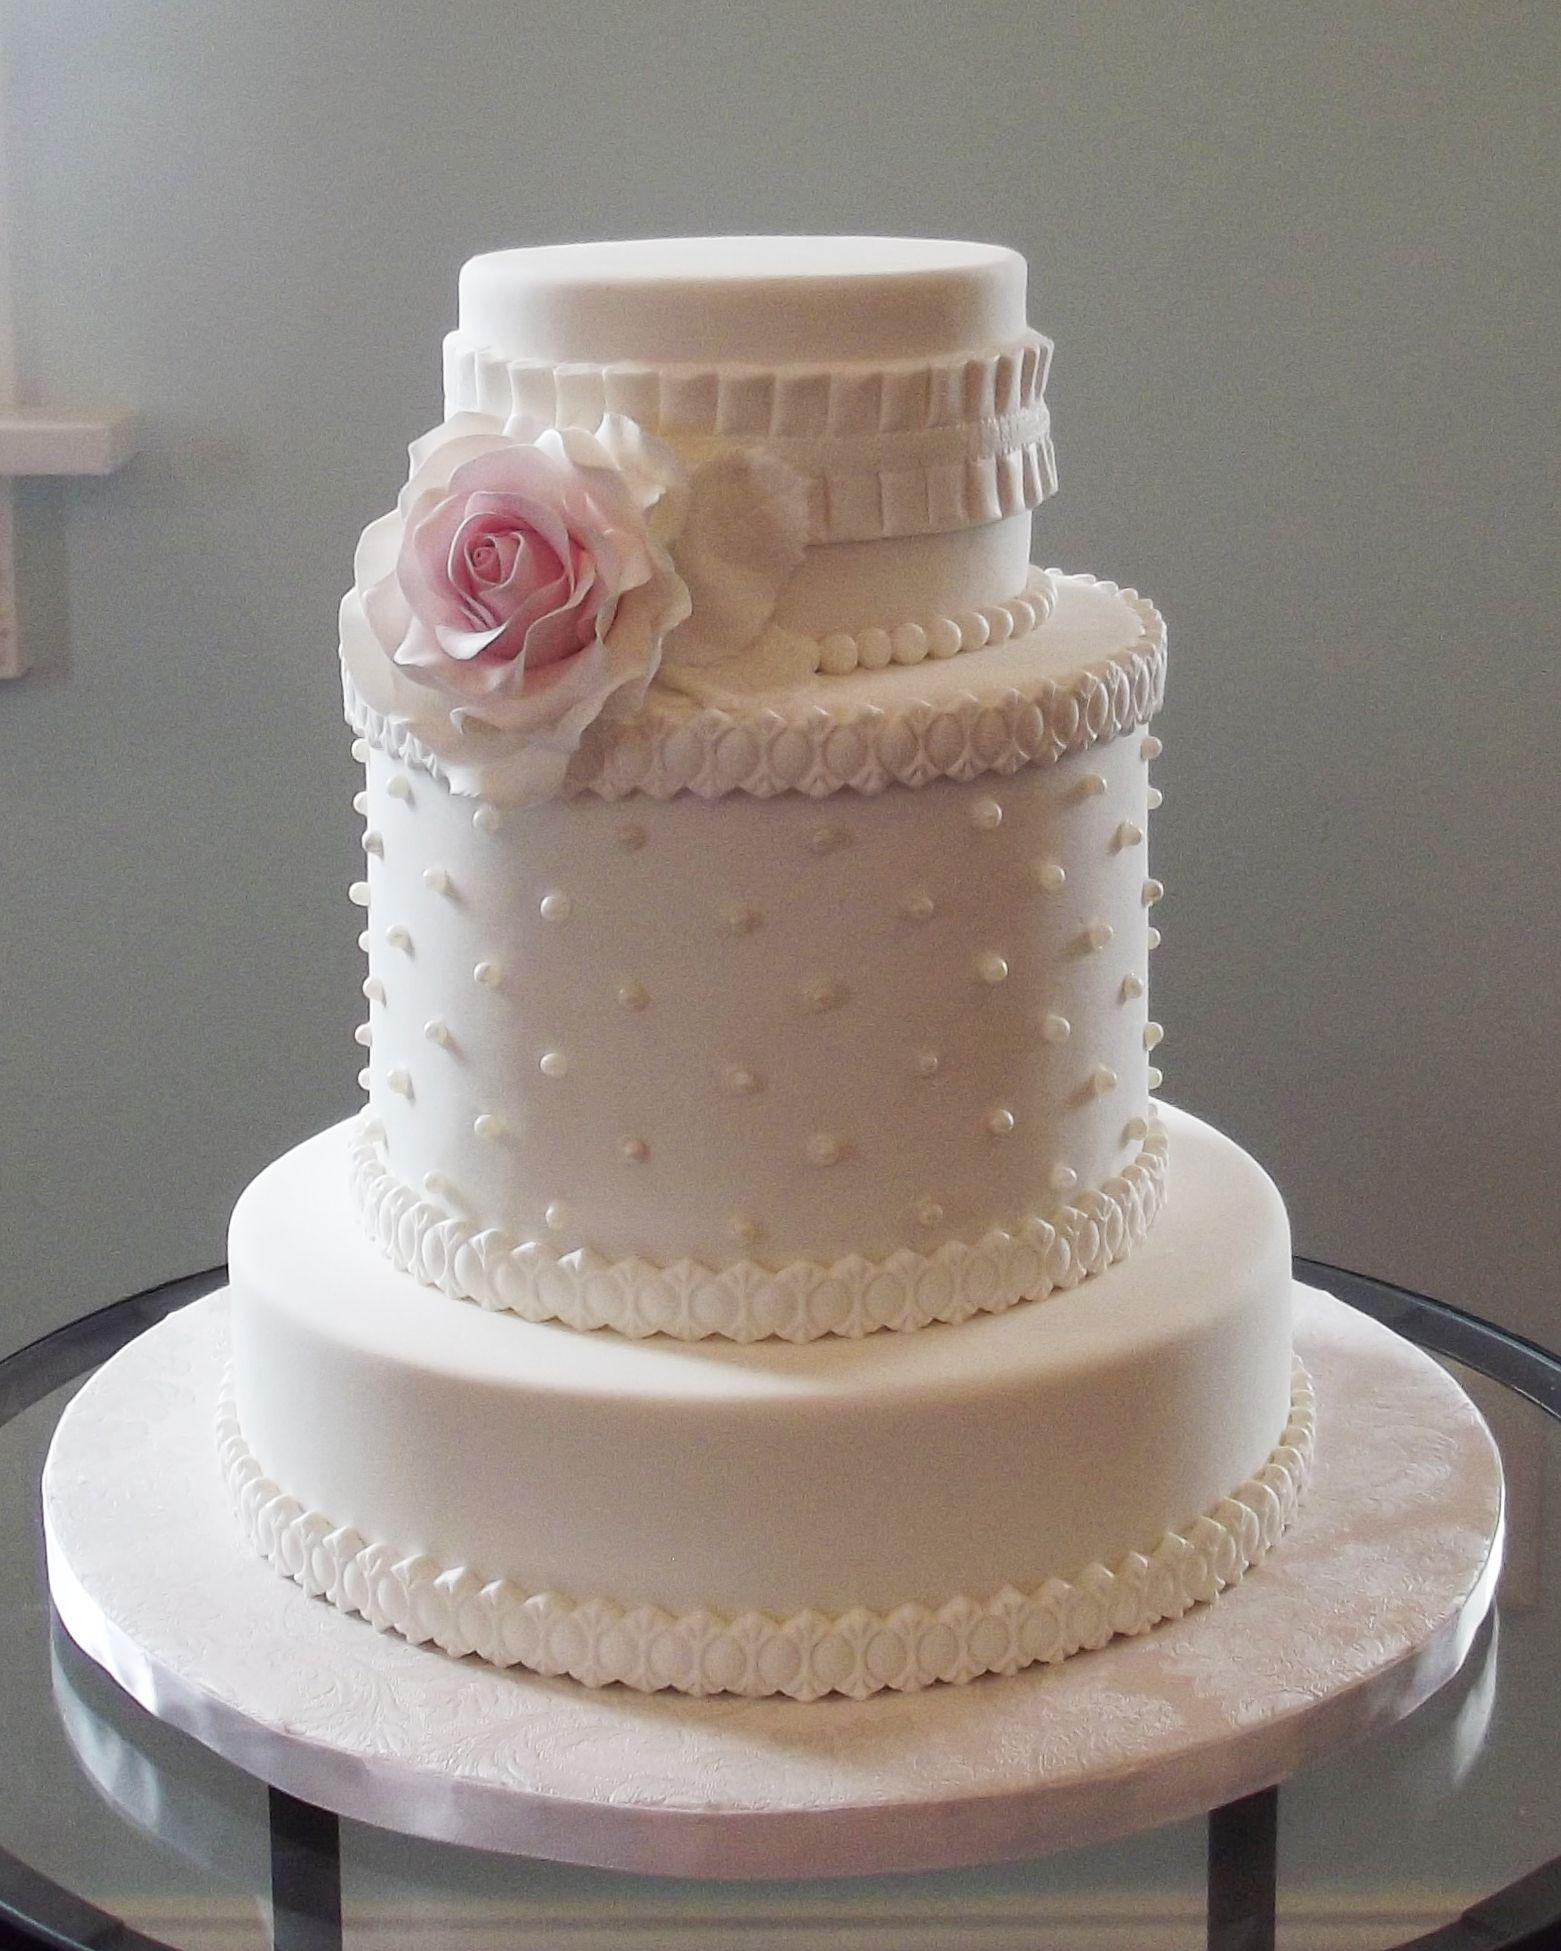 Elegant Buttercream Wedding Cakes  Pin Very Elegant Light Blue Buttercream Wedding Cake With